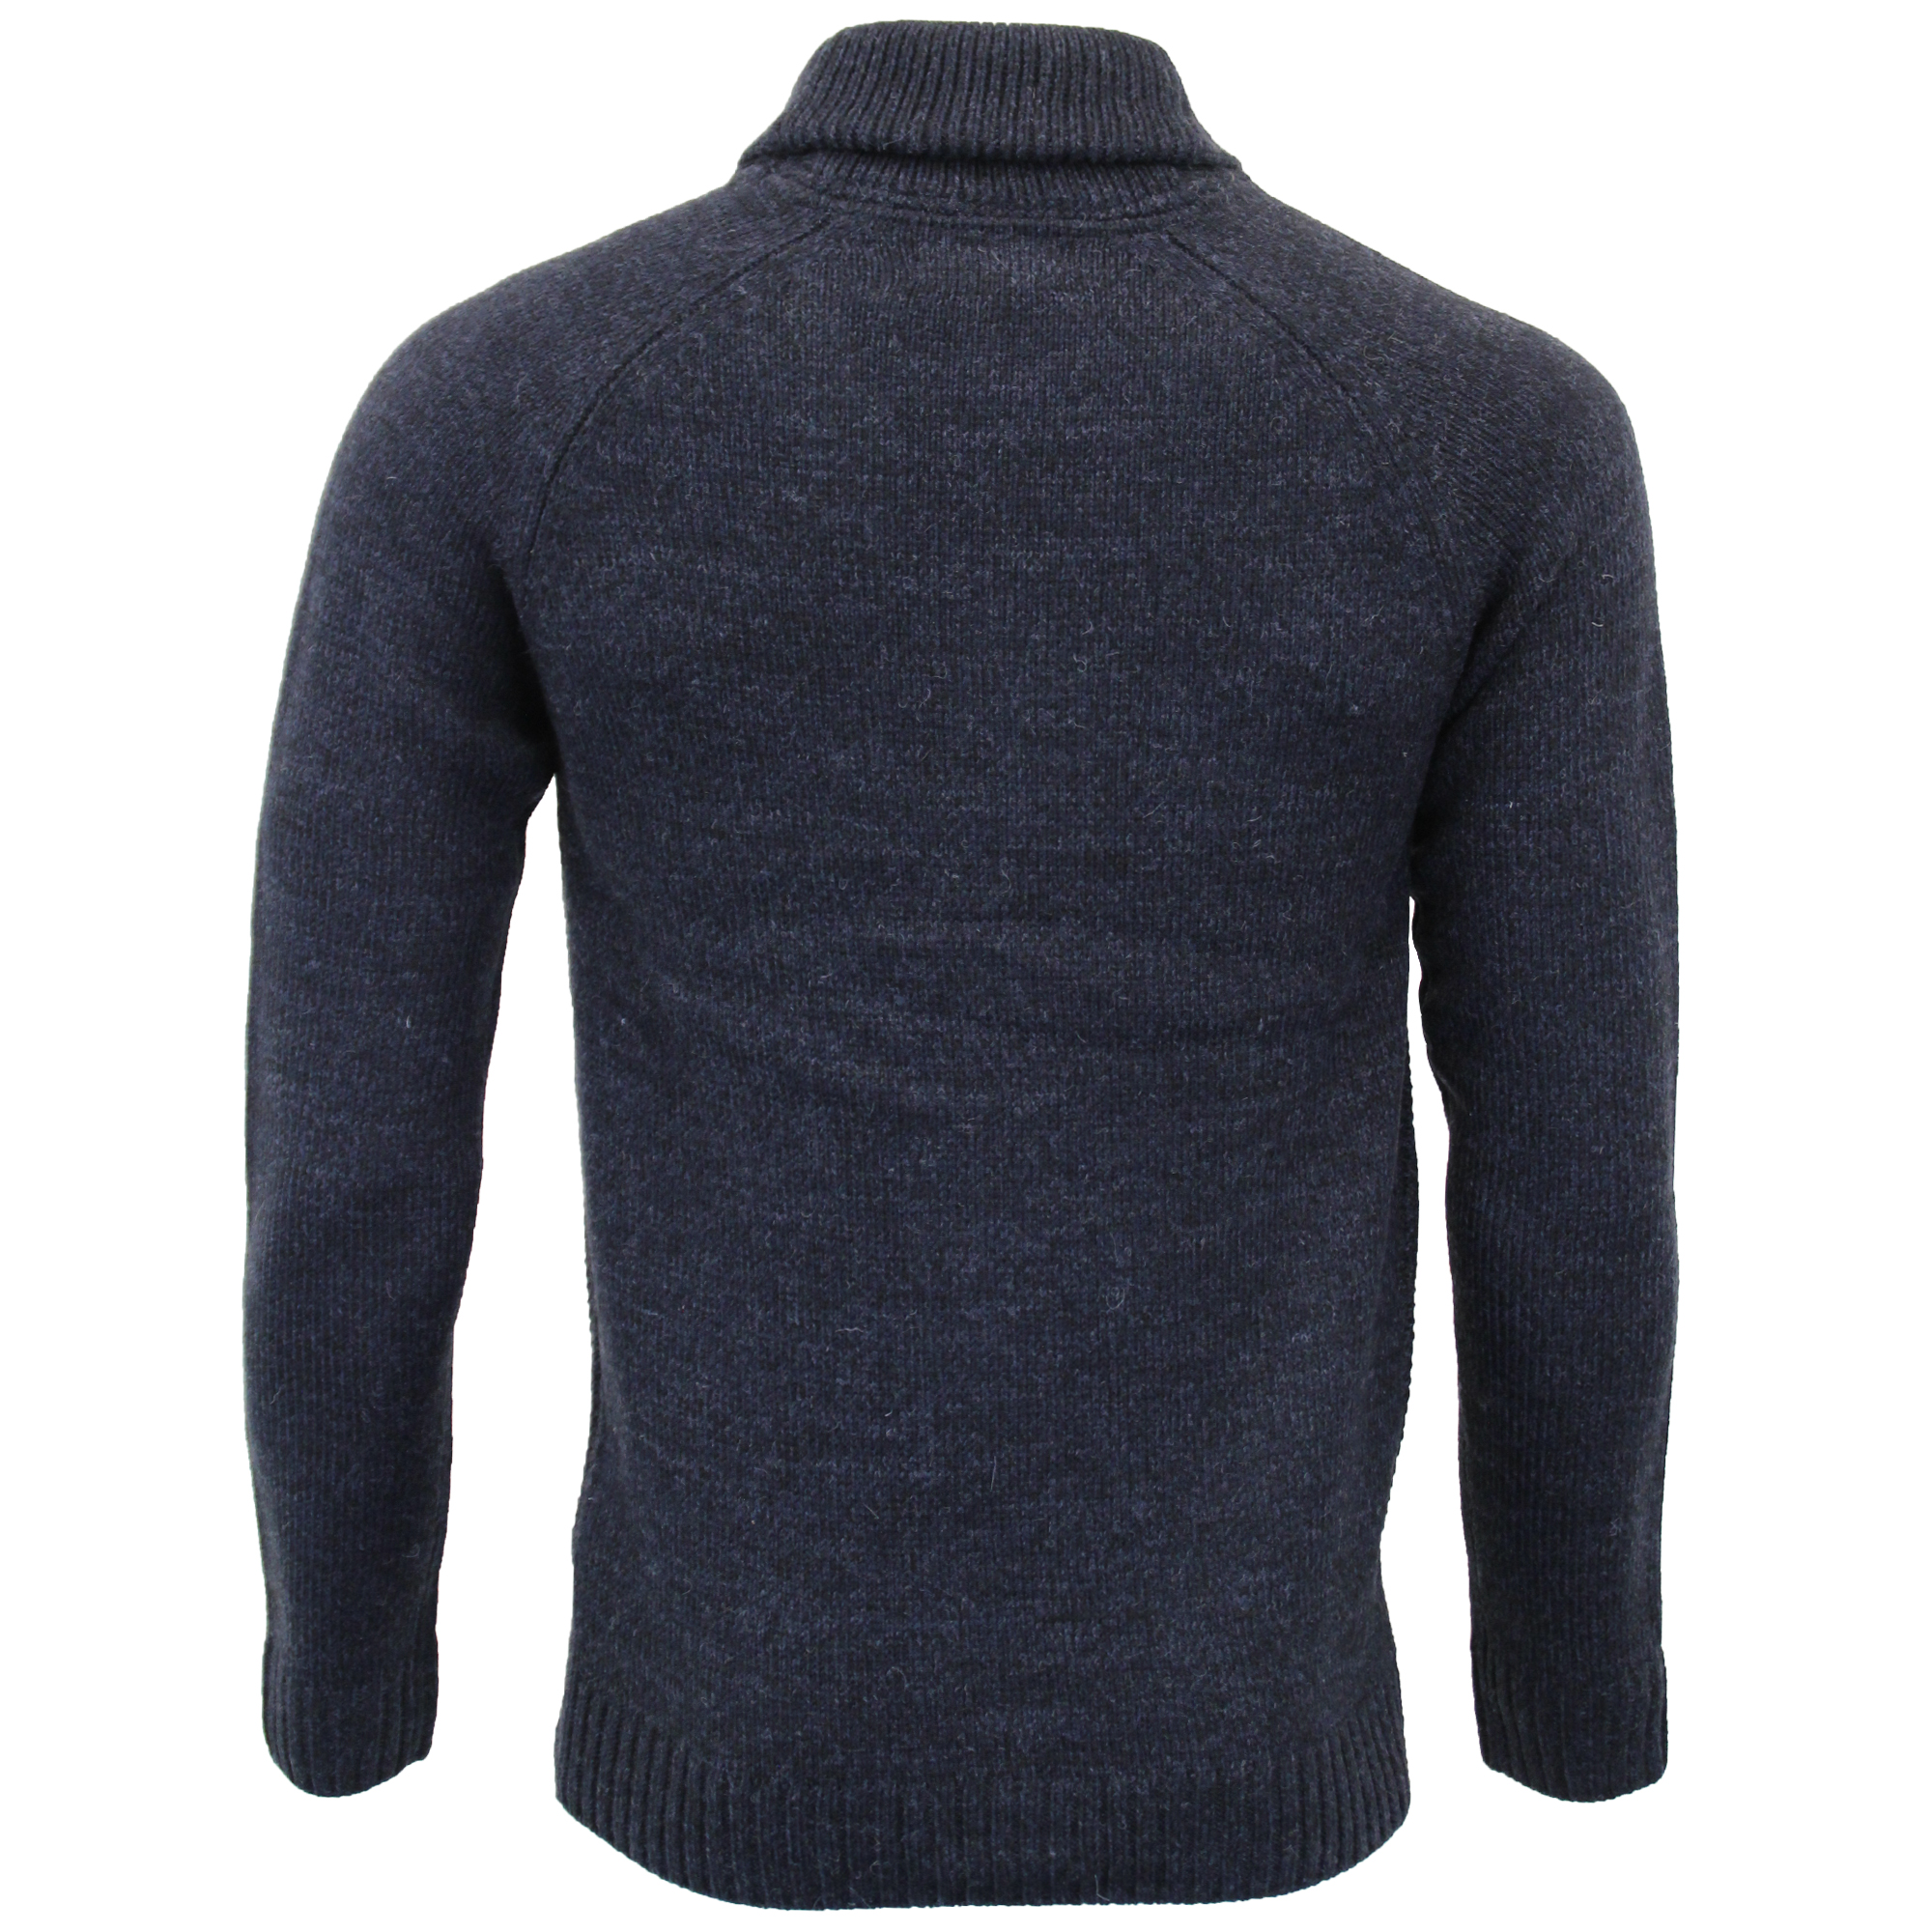 Mens-Wool-Mix-Cardigans-Threadbare-Knitted-Sweater-Broken-Standard-Shawl-Winter thumbnail 18